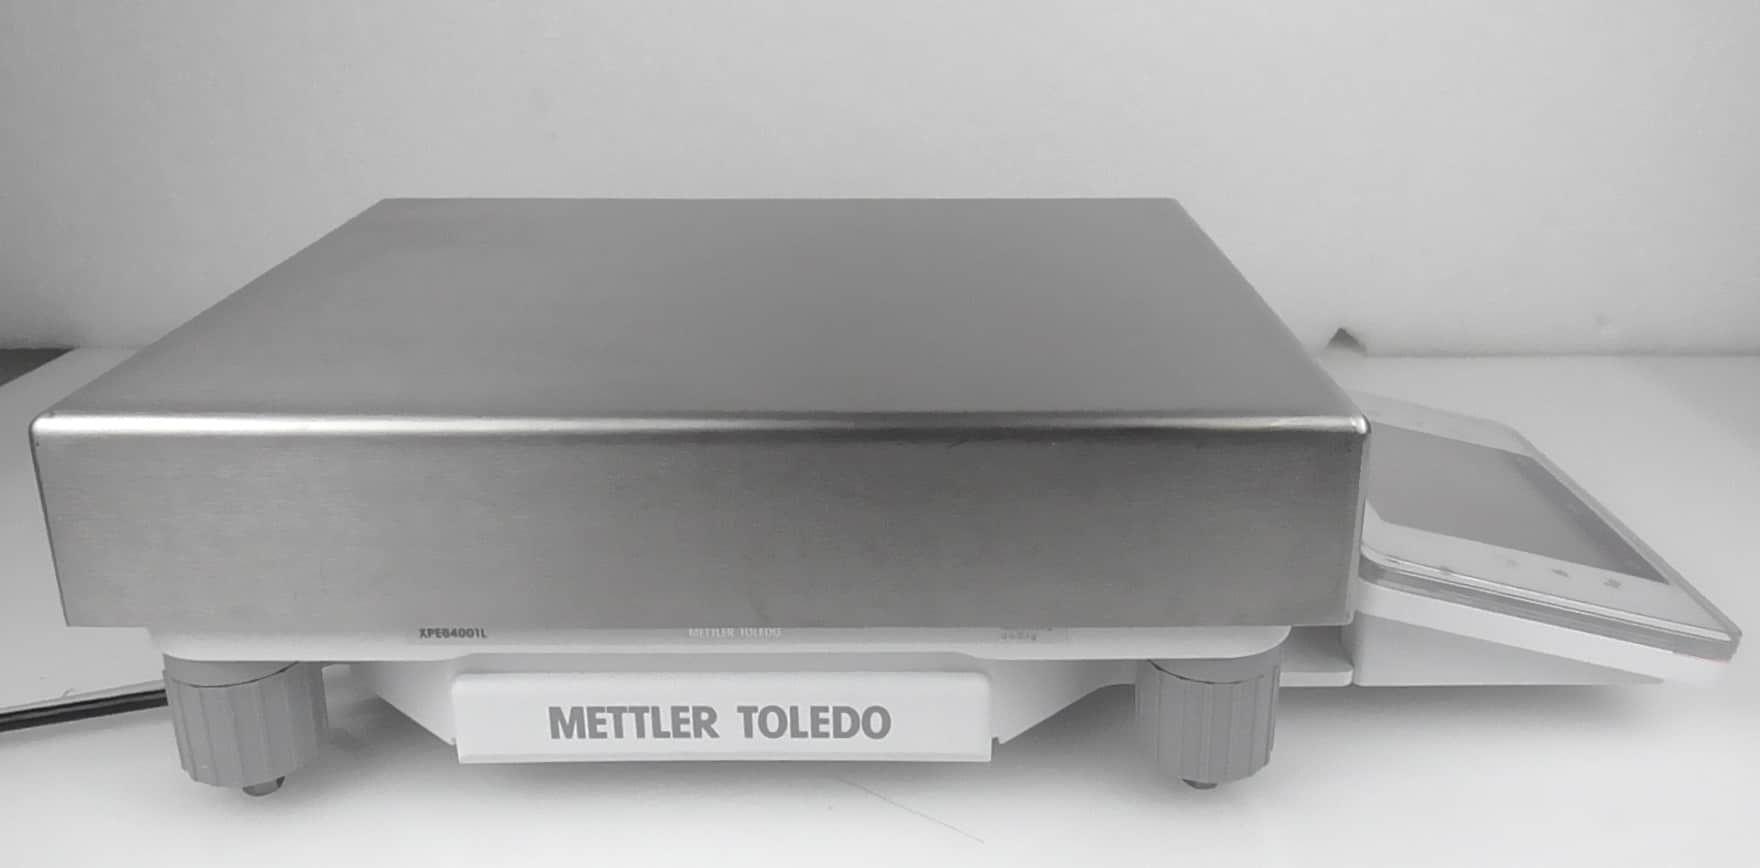 Mettler Toledo XPE64001L Balance